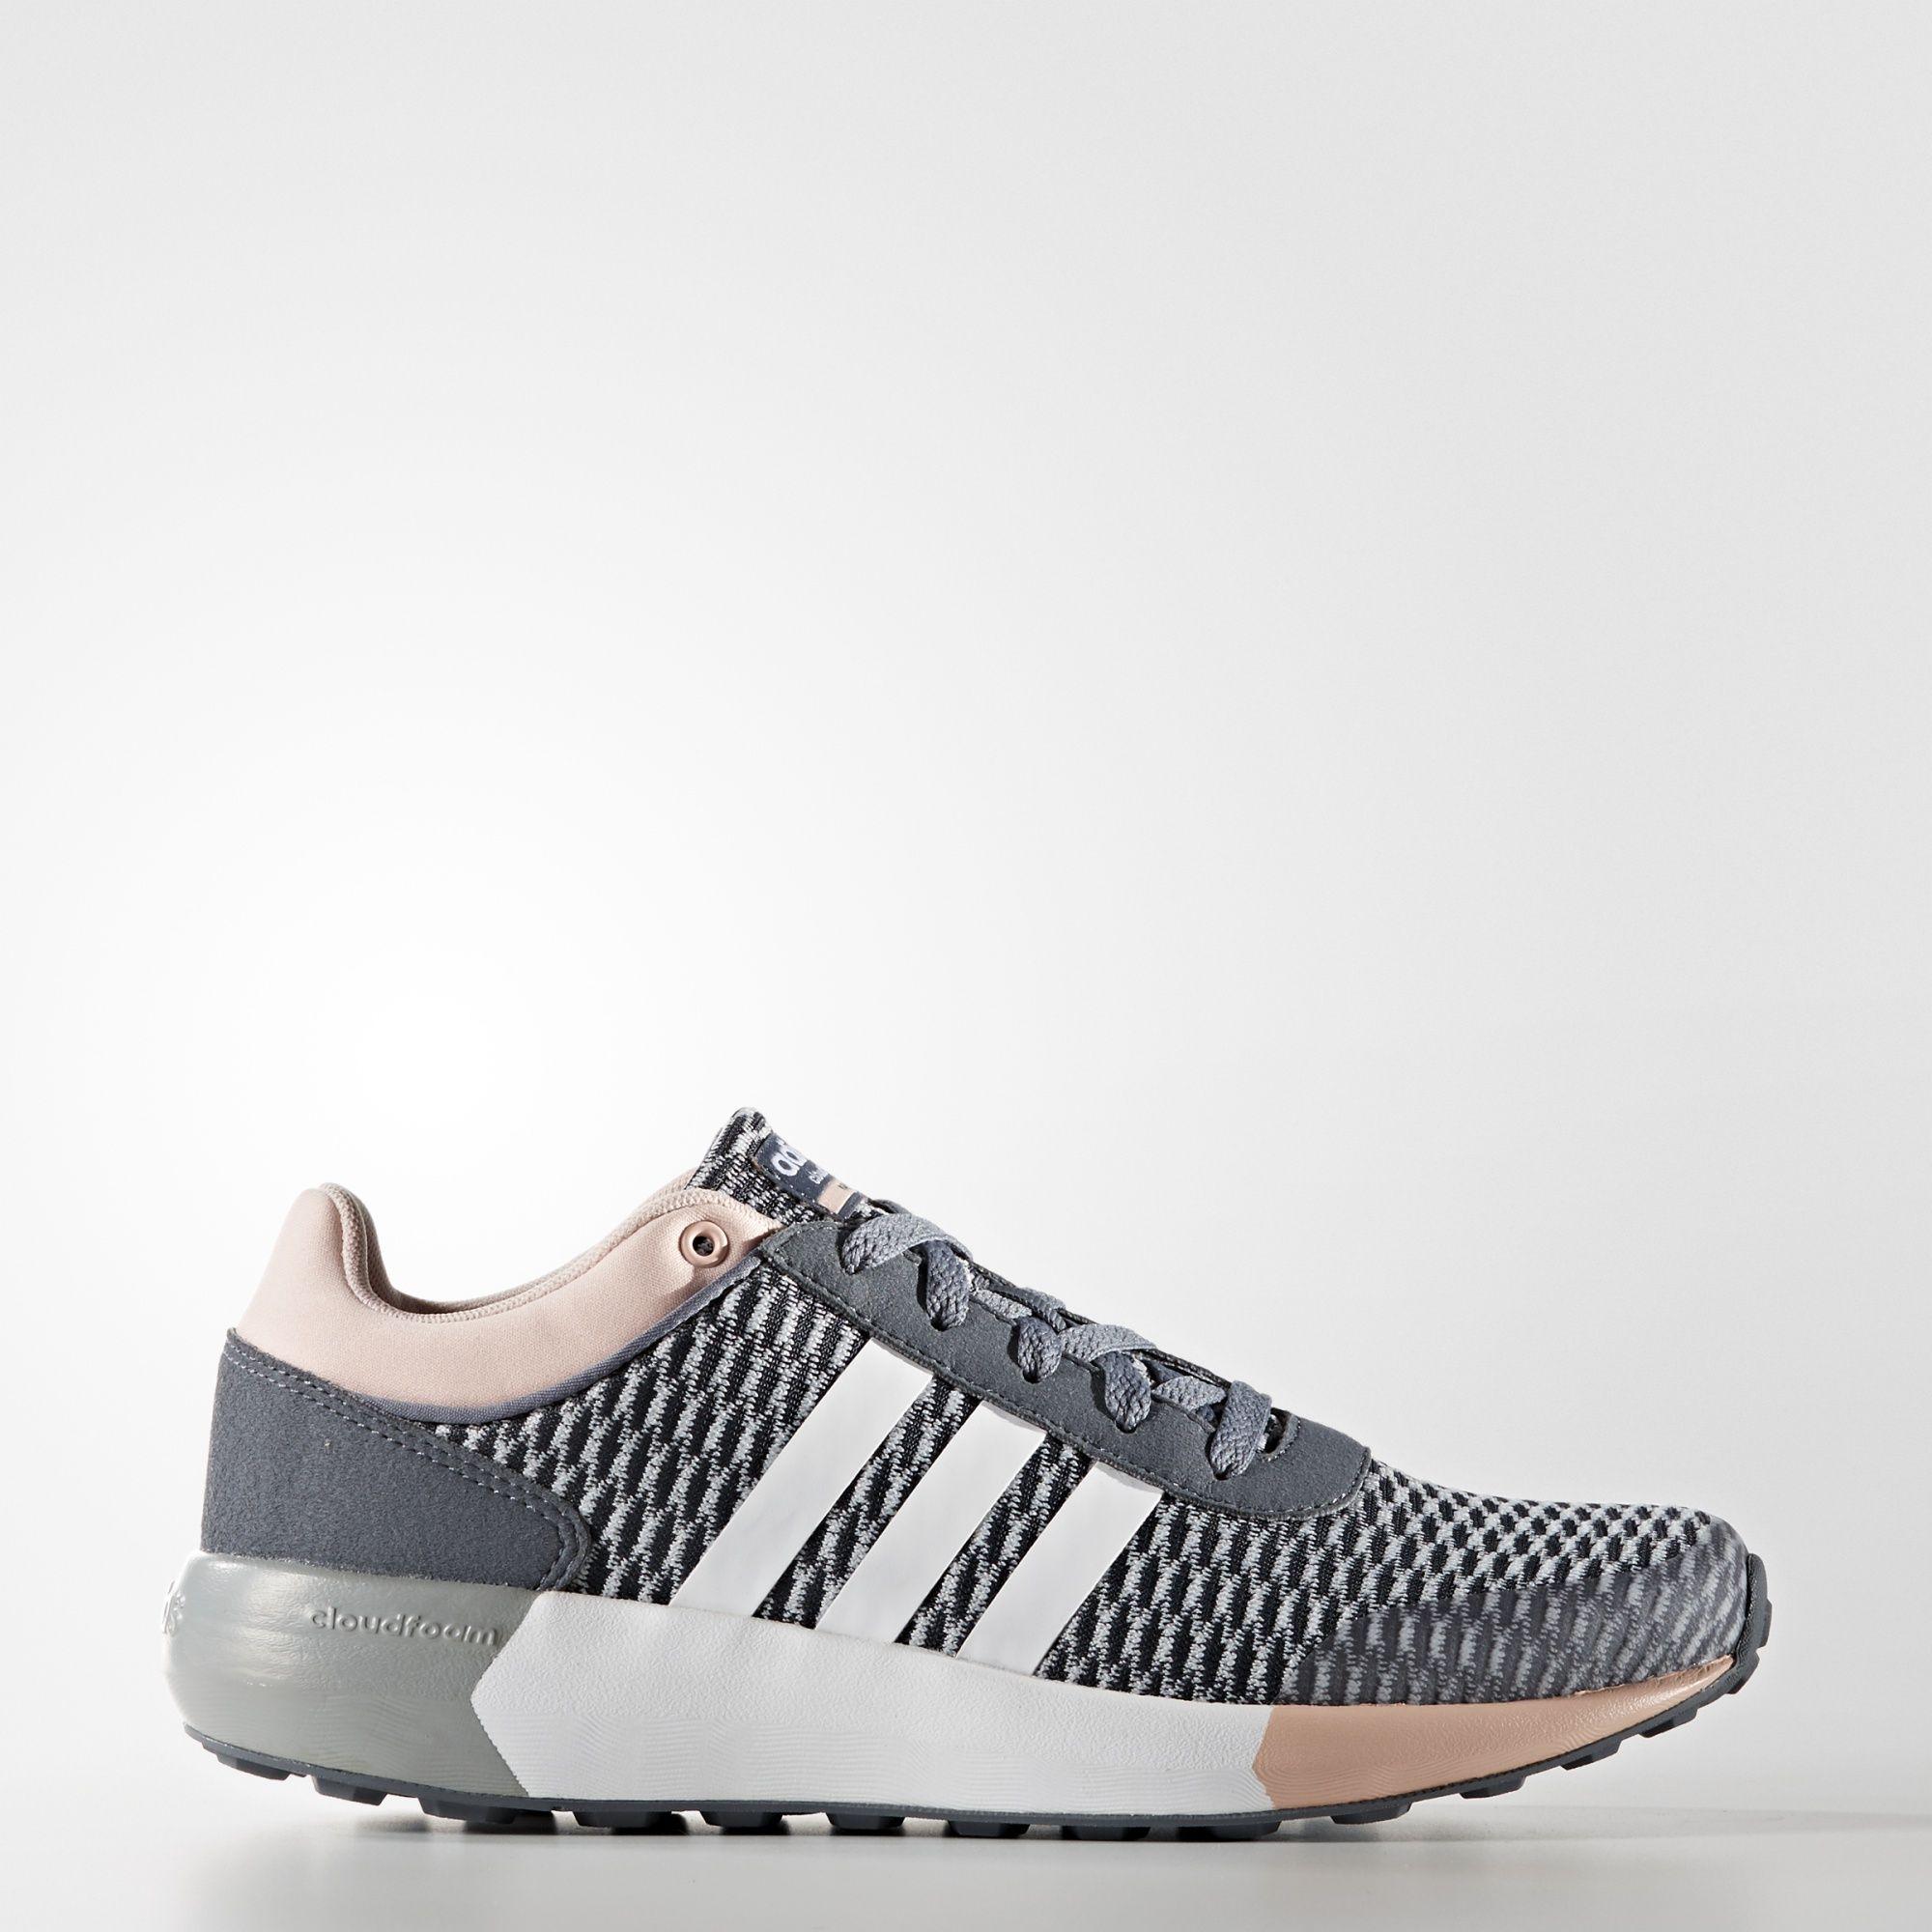 Adidas Shoes on Twitter. Naisten AdidaksetTyttöjen KengätAdidas OriginalsNike  ... a4b53d9633